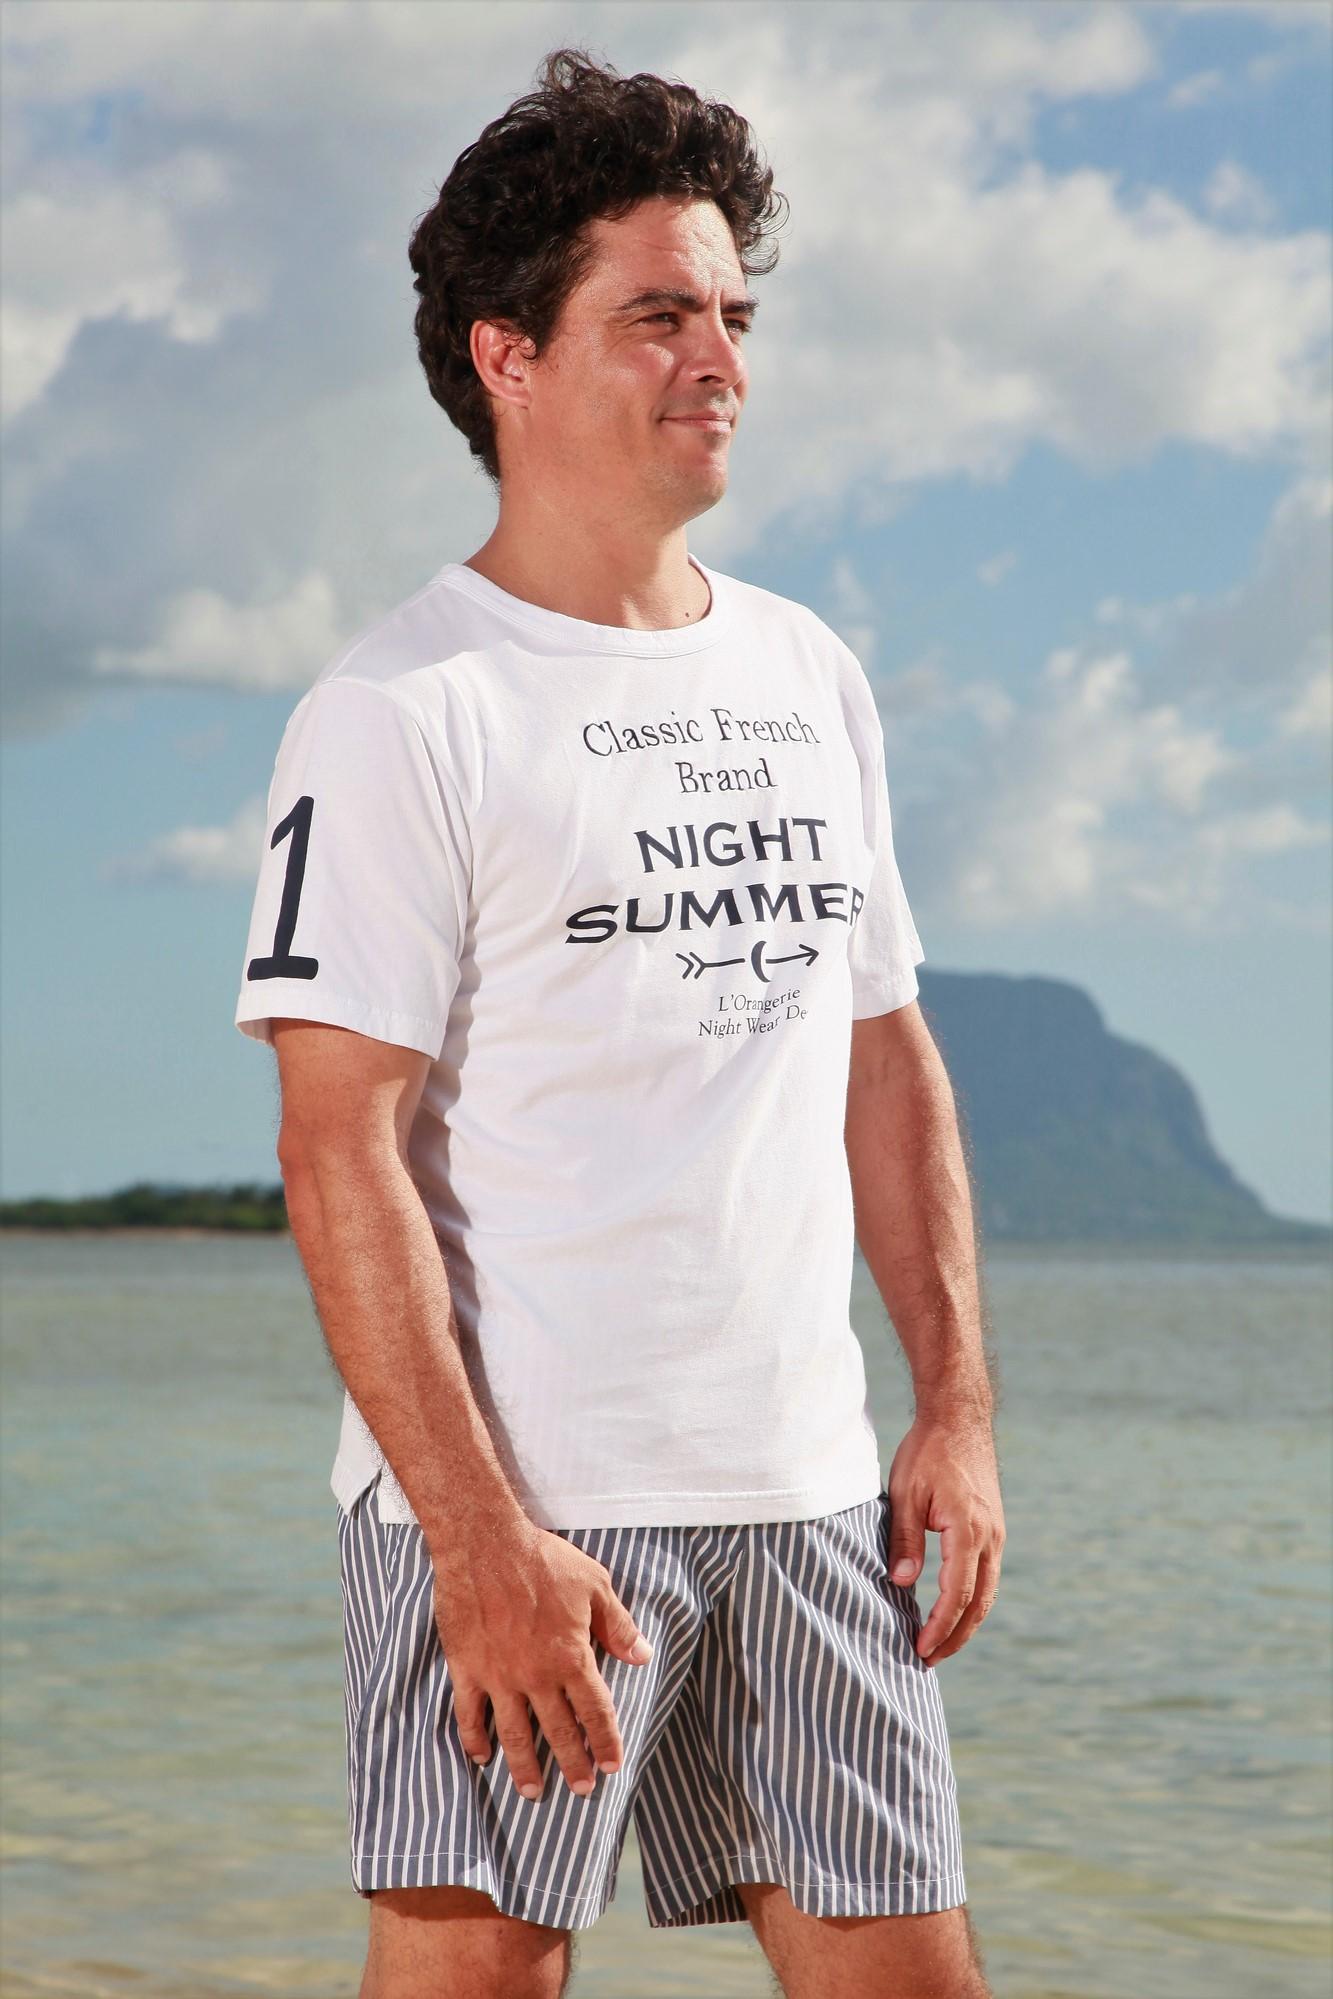 Tennis Senior Pyjama Rayures Pour L'orangerie Homme Court À Marine TJ3cFK1ul